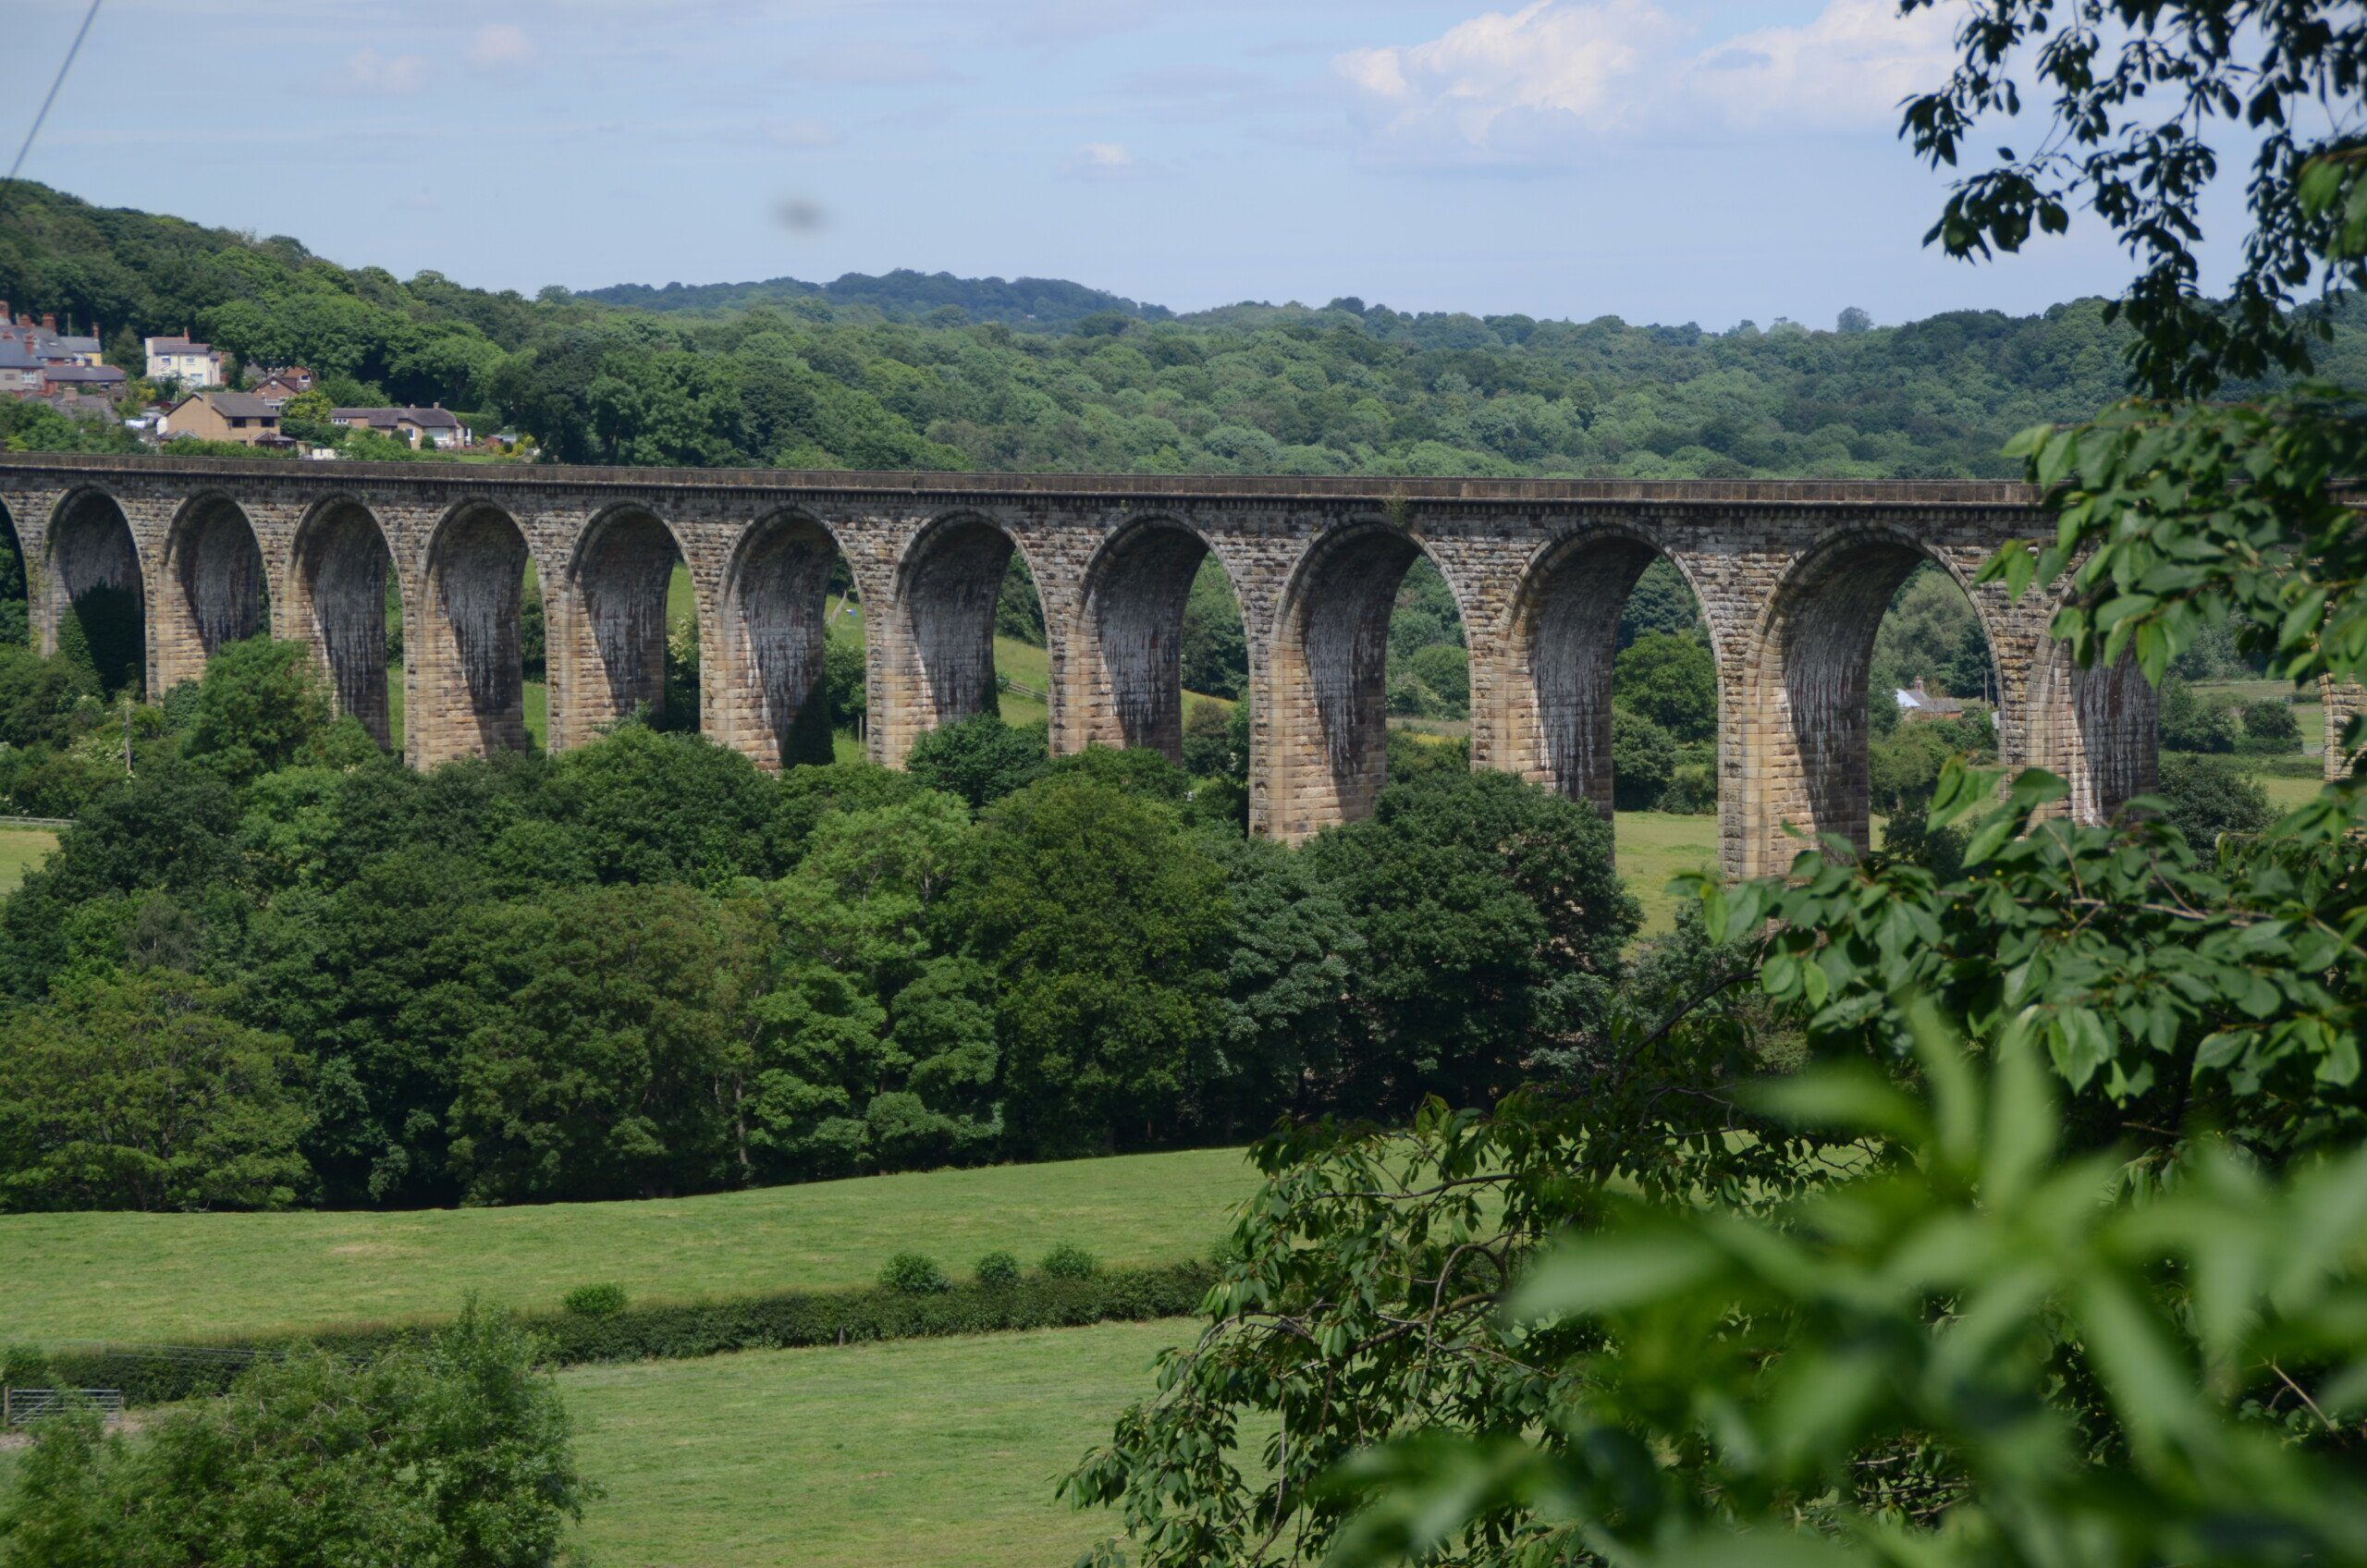 The spectacular Pontcysyllite Aqueduct rising high above the trees.